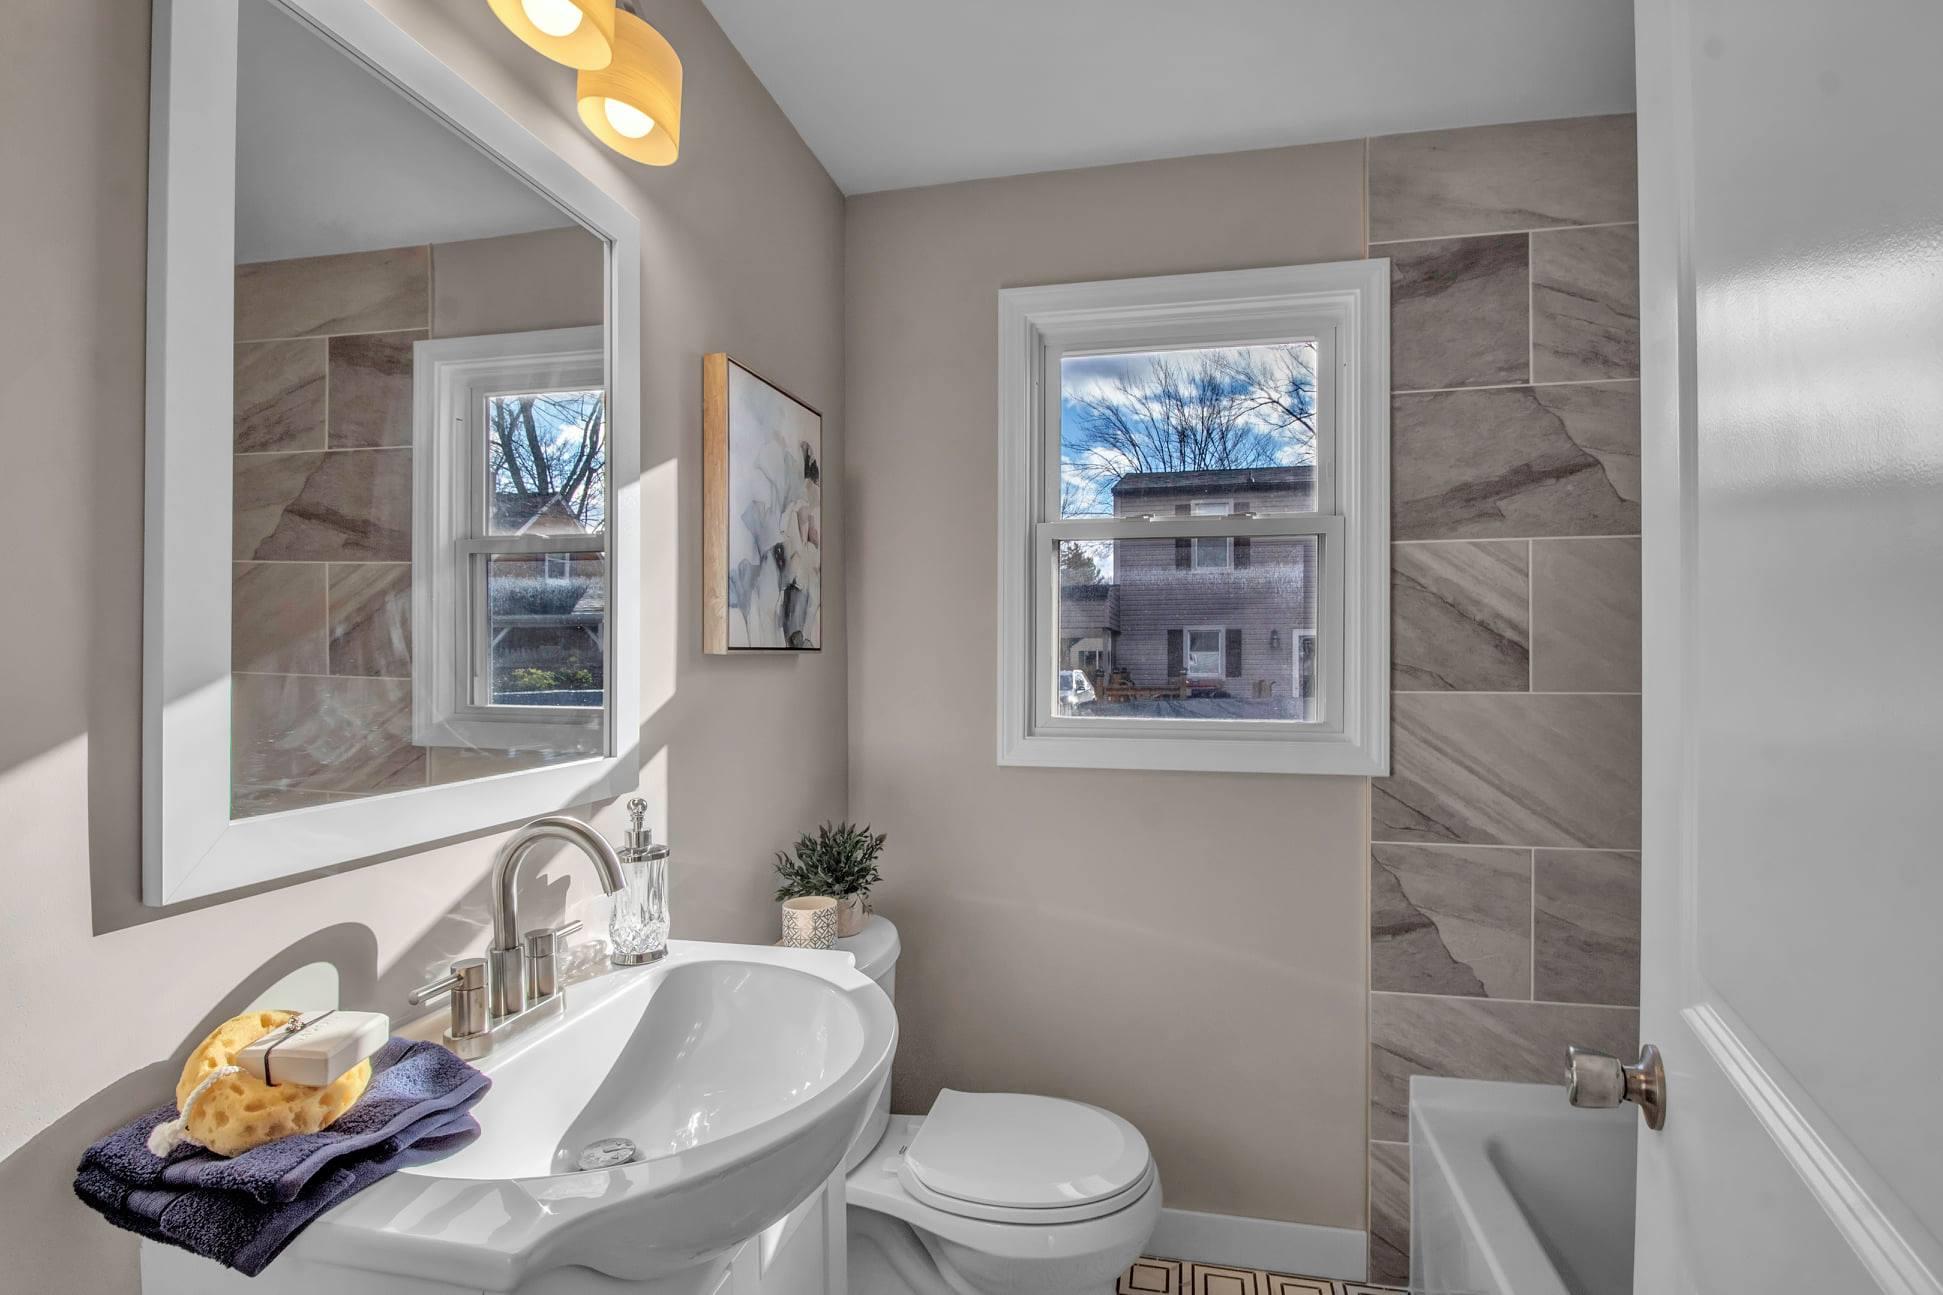 average cost of new bathroom